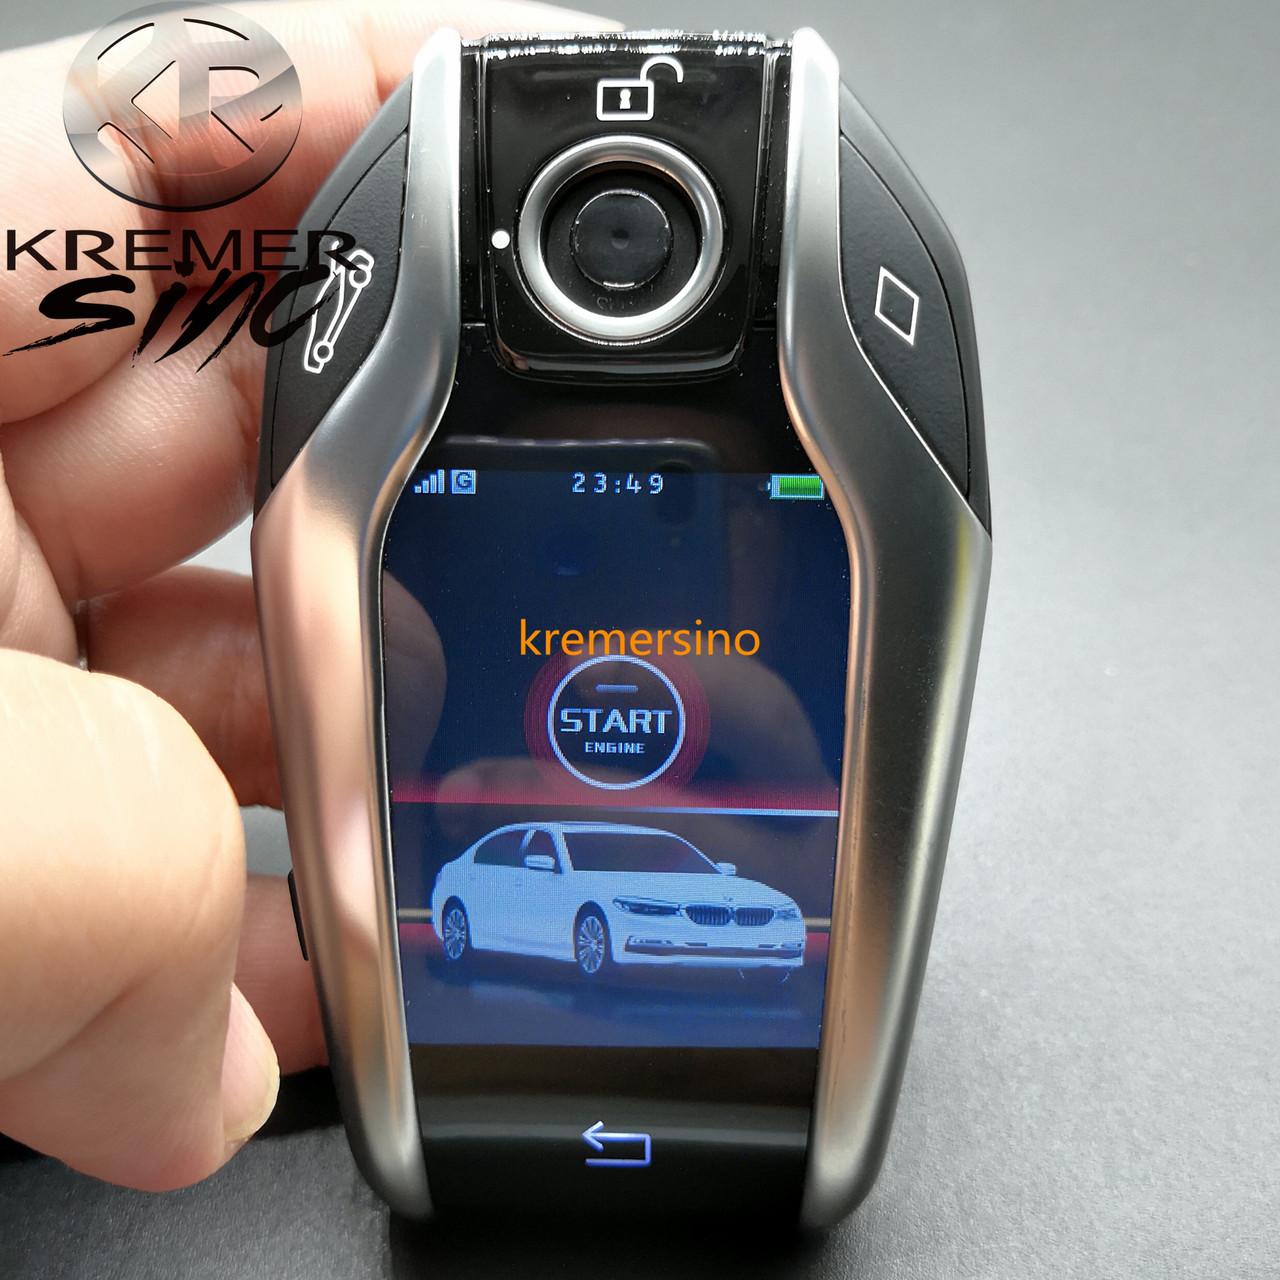 Aftermarket Display Key For Bmw G Model F Model Bmw Keyfob With Display Key Fob With Touch Screen